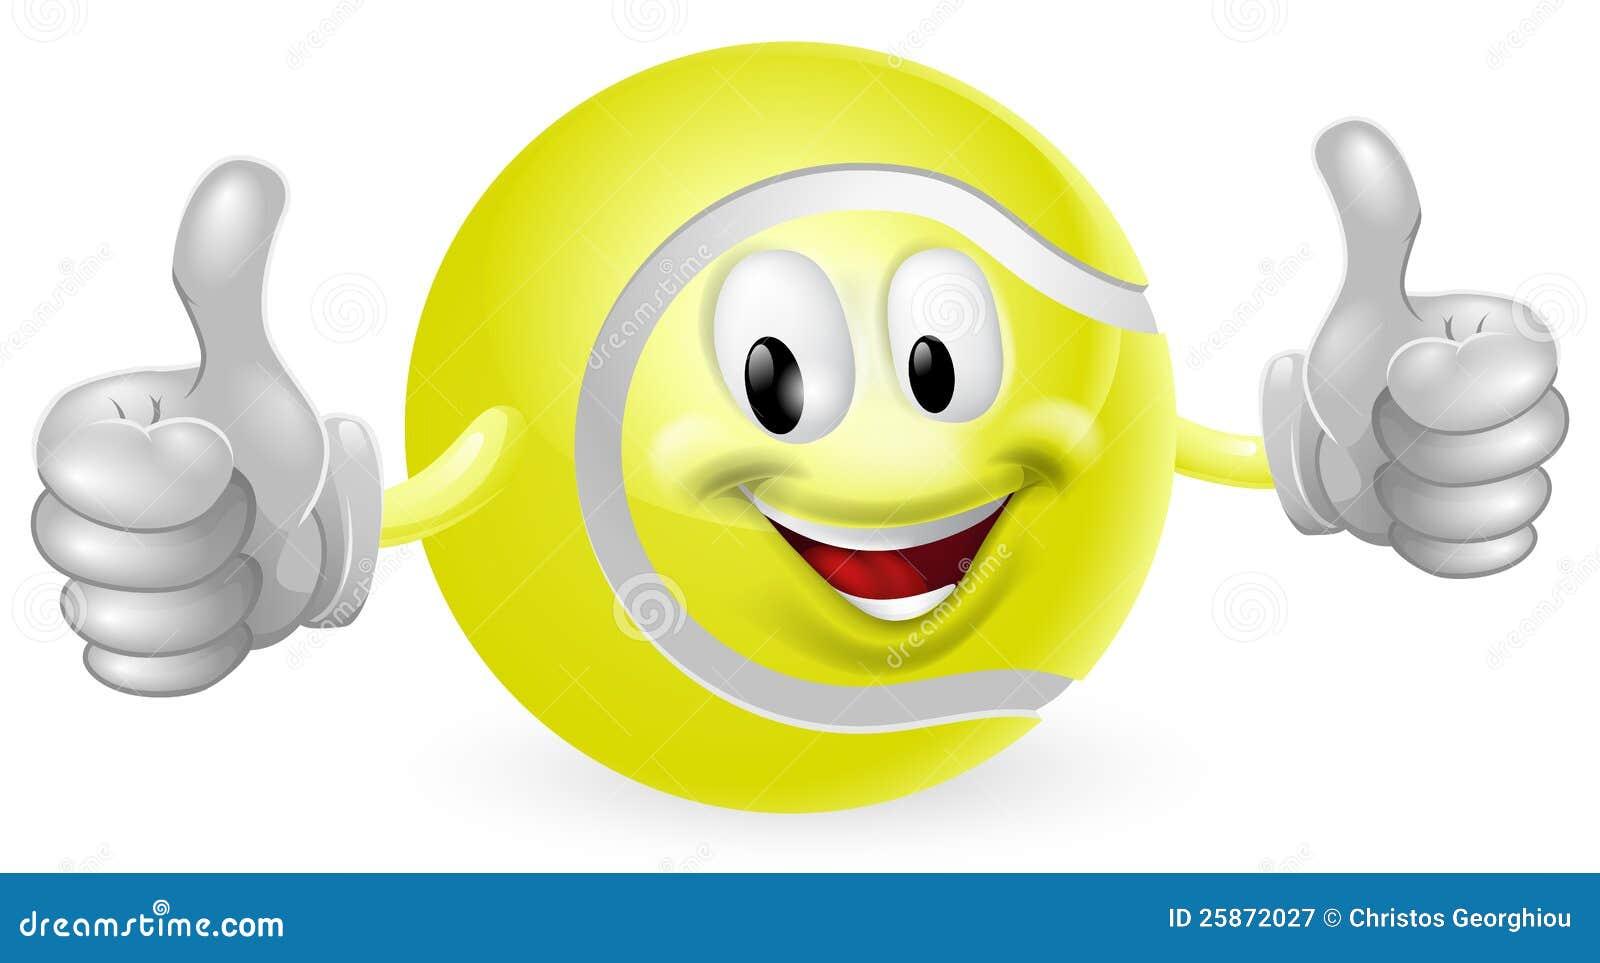 Tennis ball mascot stock photos tennis ball mascot stock photography - Tennis Ball Mascot Royalty Free Stock Photography